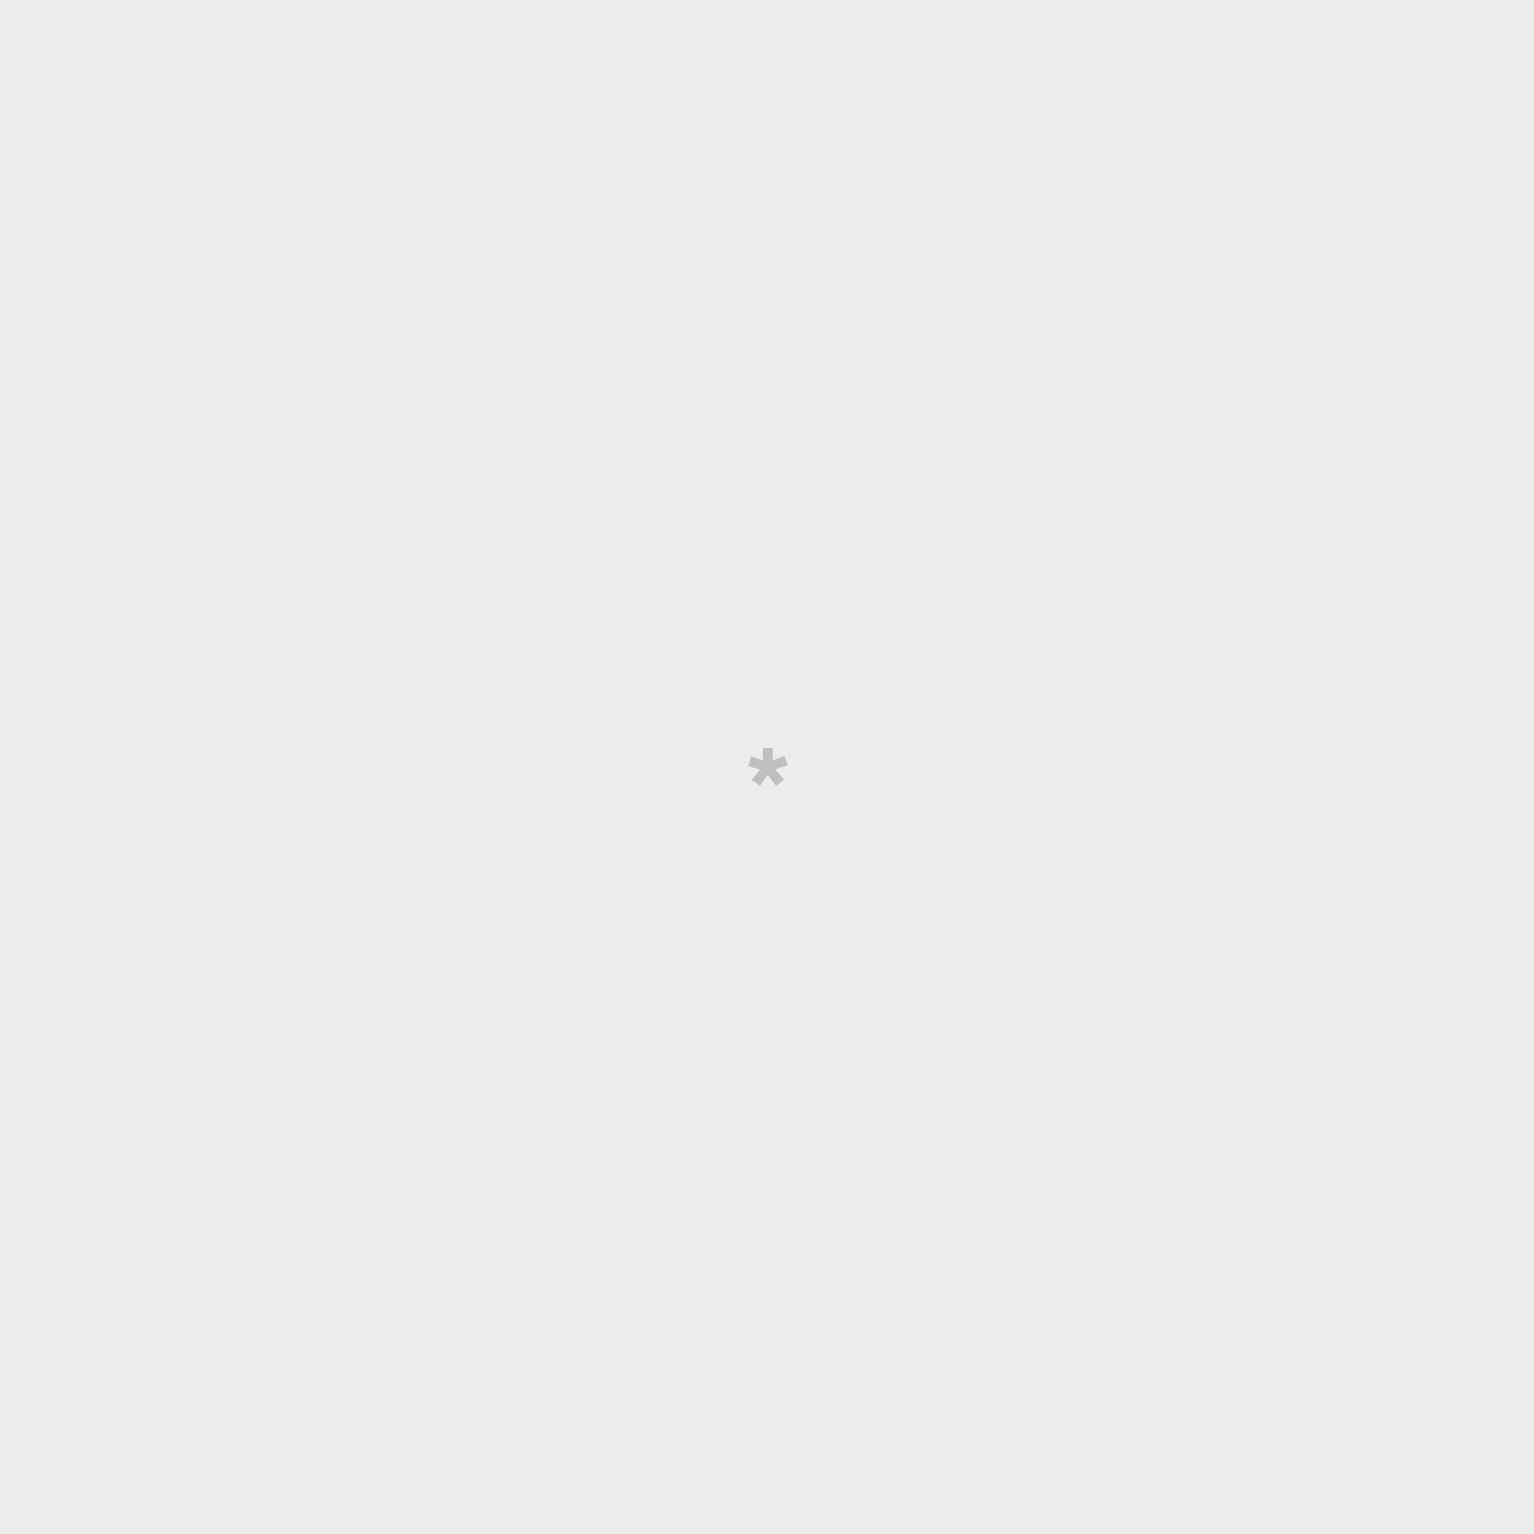 Socks - Mum glows wherever she goes